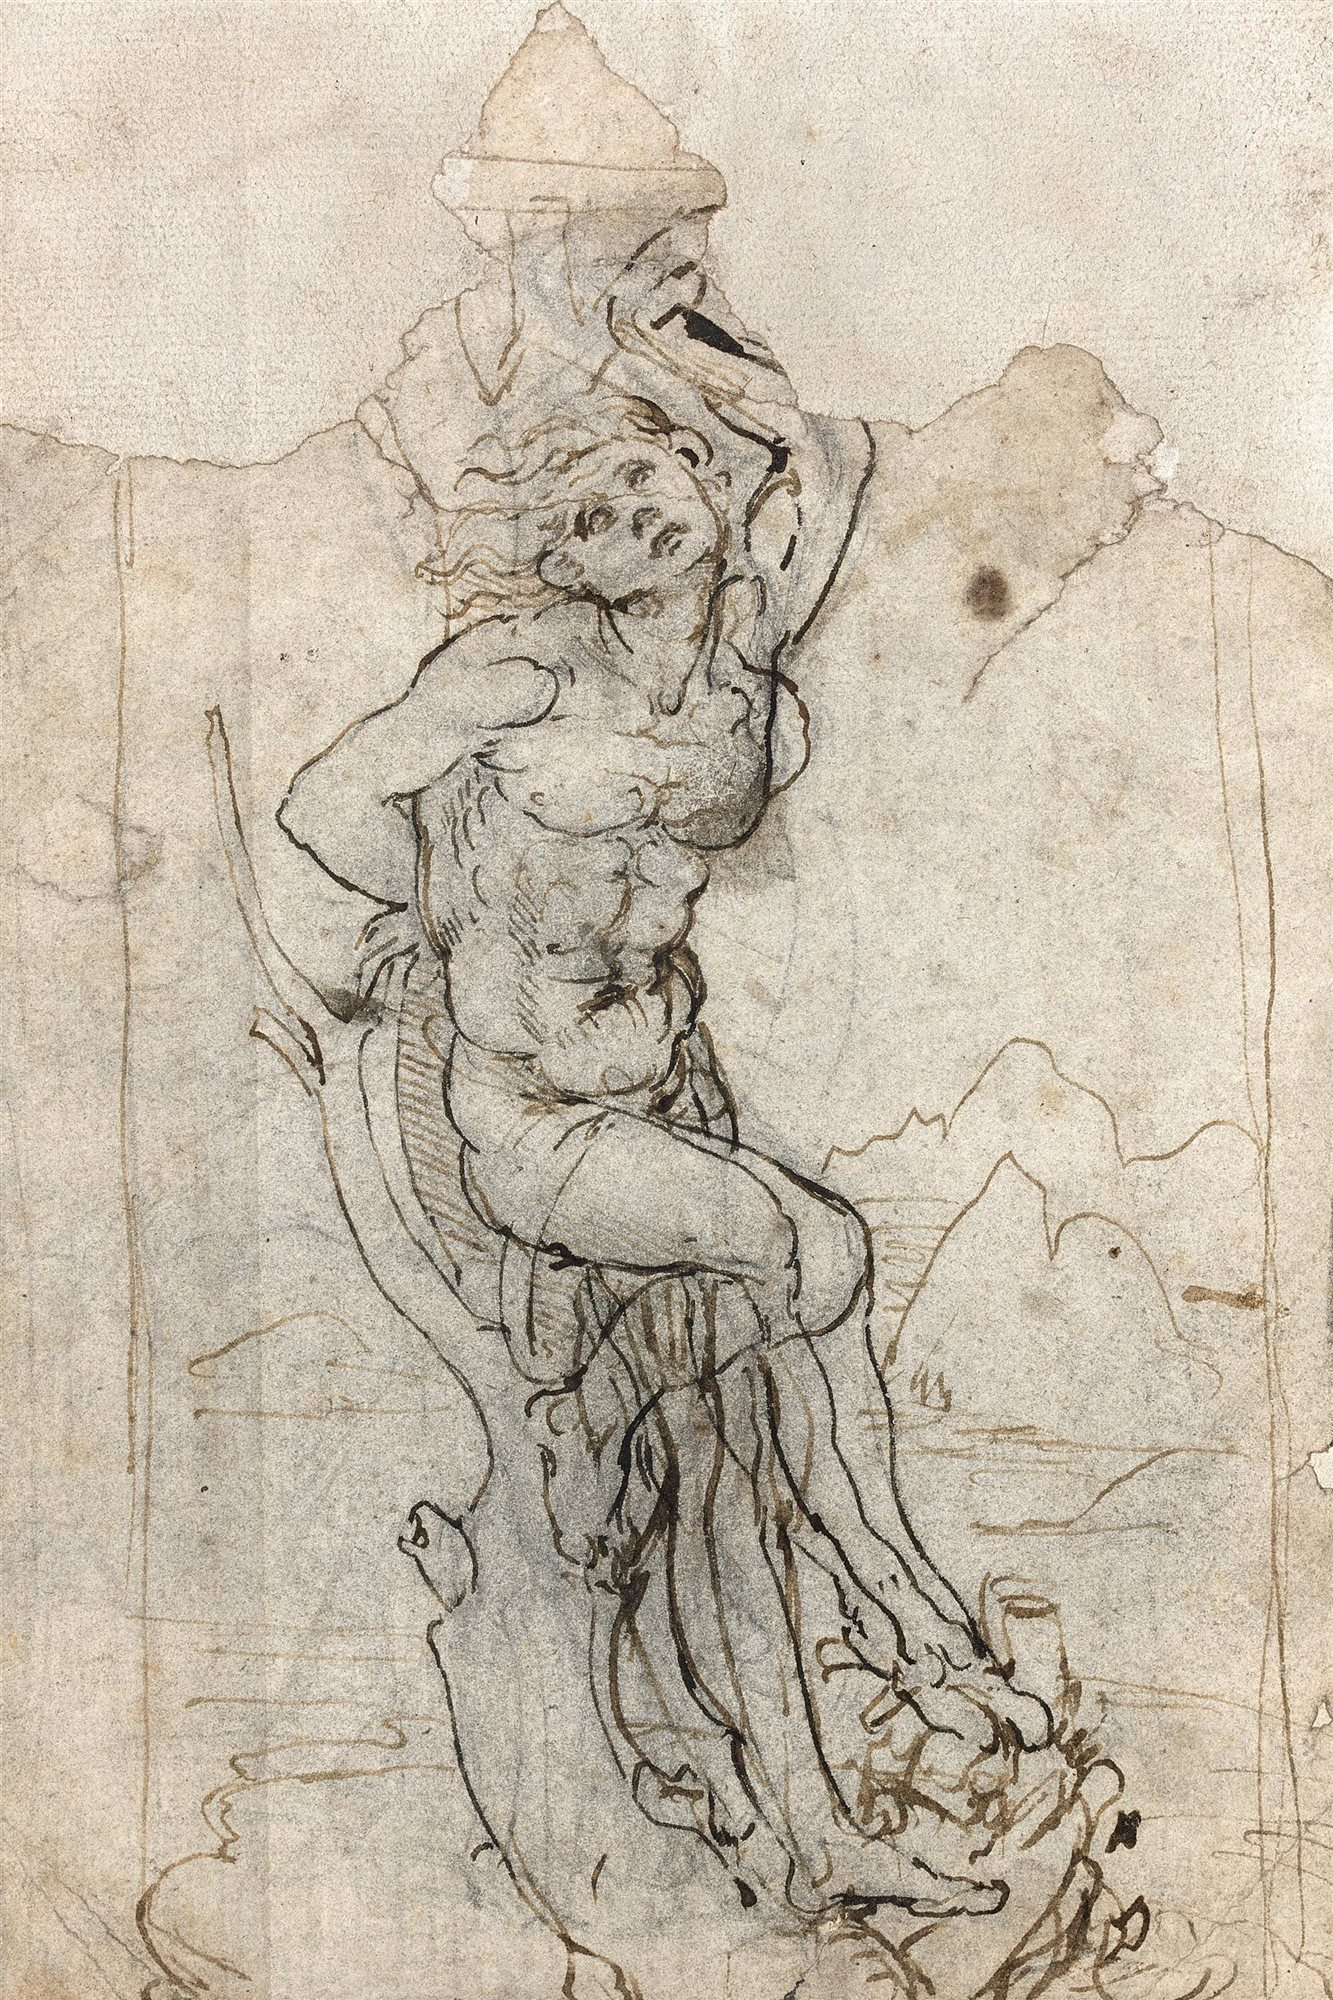 Una casa de subastas francesa descubre un dibujo de Leonardo da Vinci